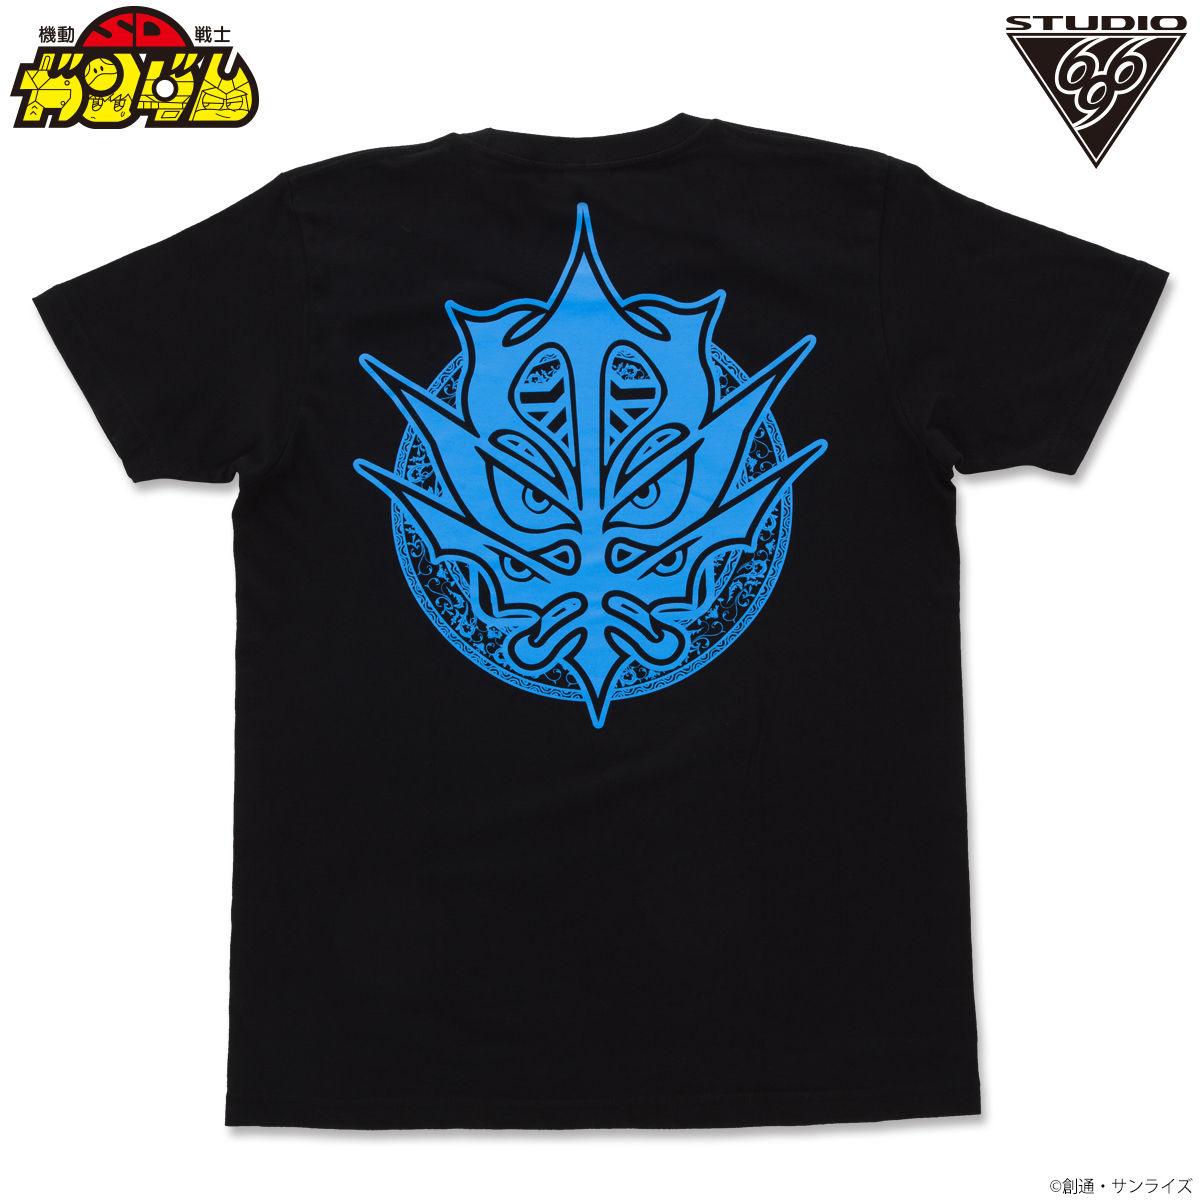 SD高達  巨人重高達魔像與泥塑巨人 T-SHIRT feat.STUDIO696